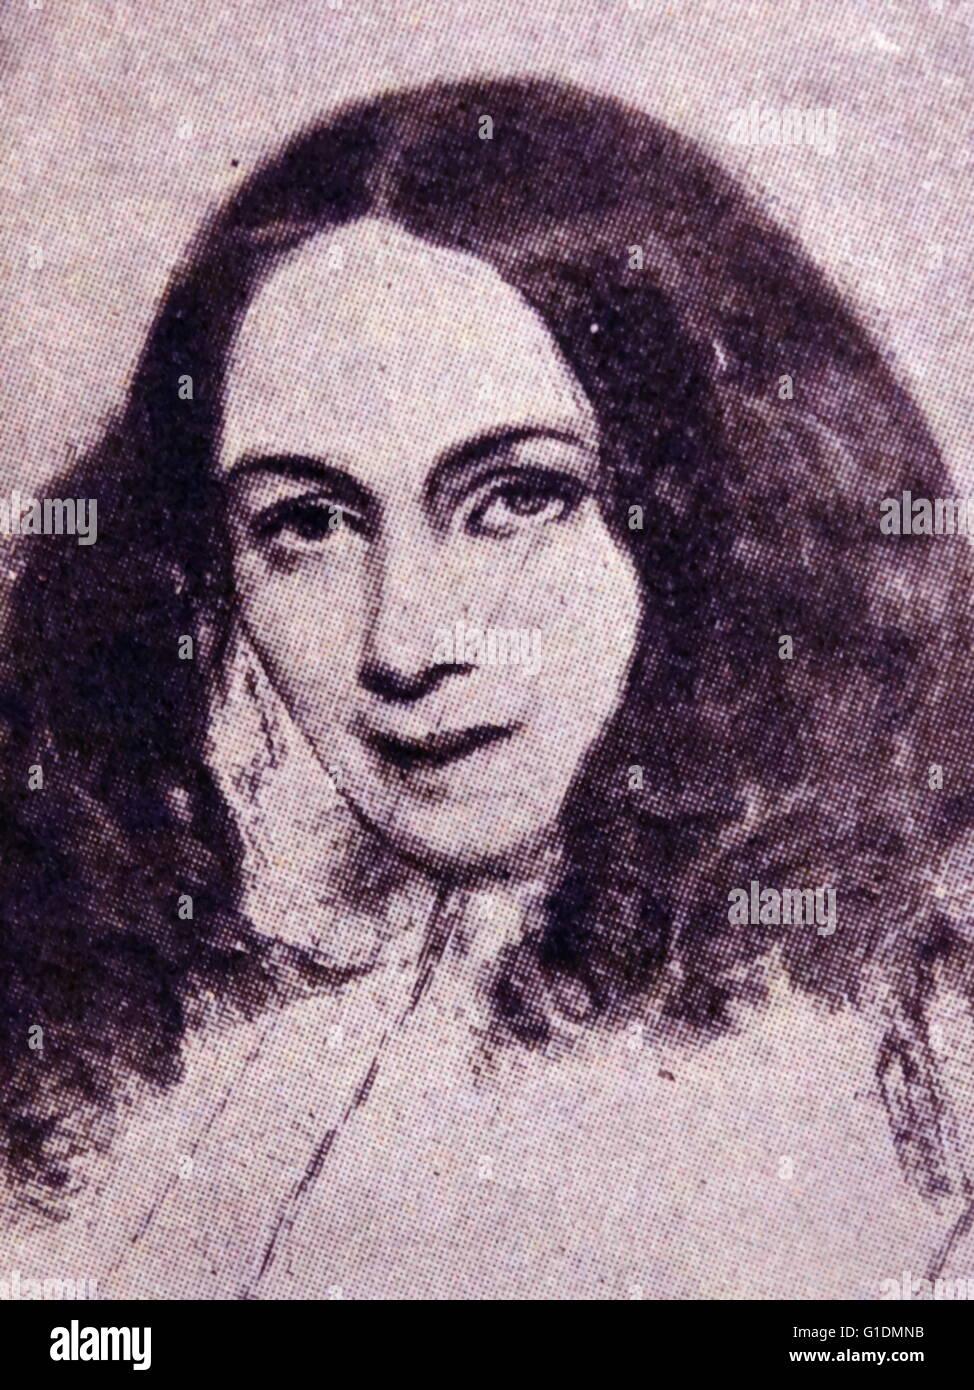 Portrait of Elizabeth Barrett Browning (1806-1861) English poet. Dated 19th Century - Stock Image